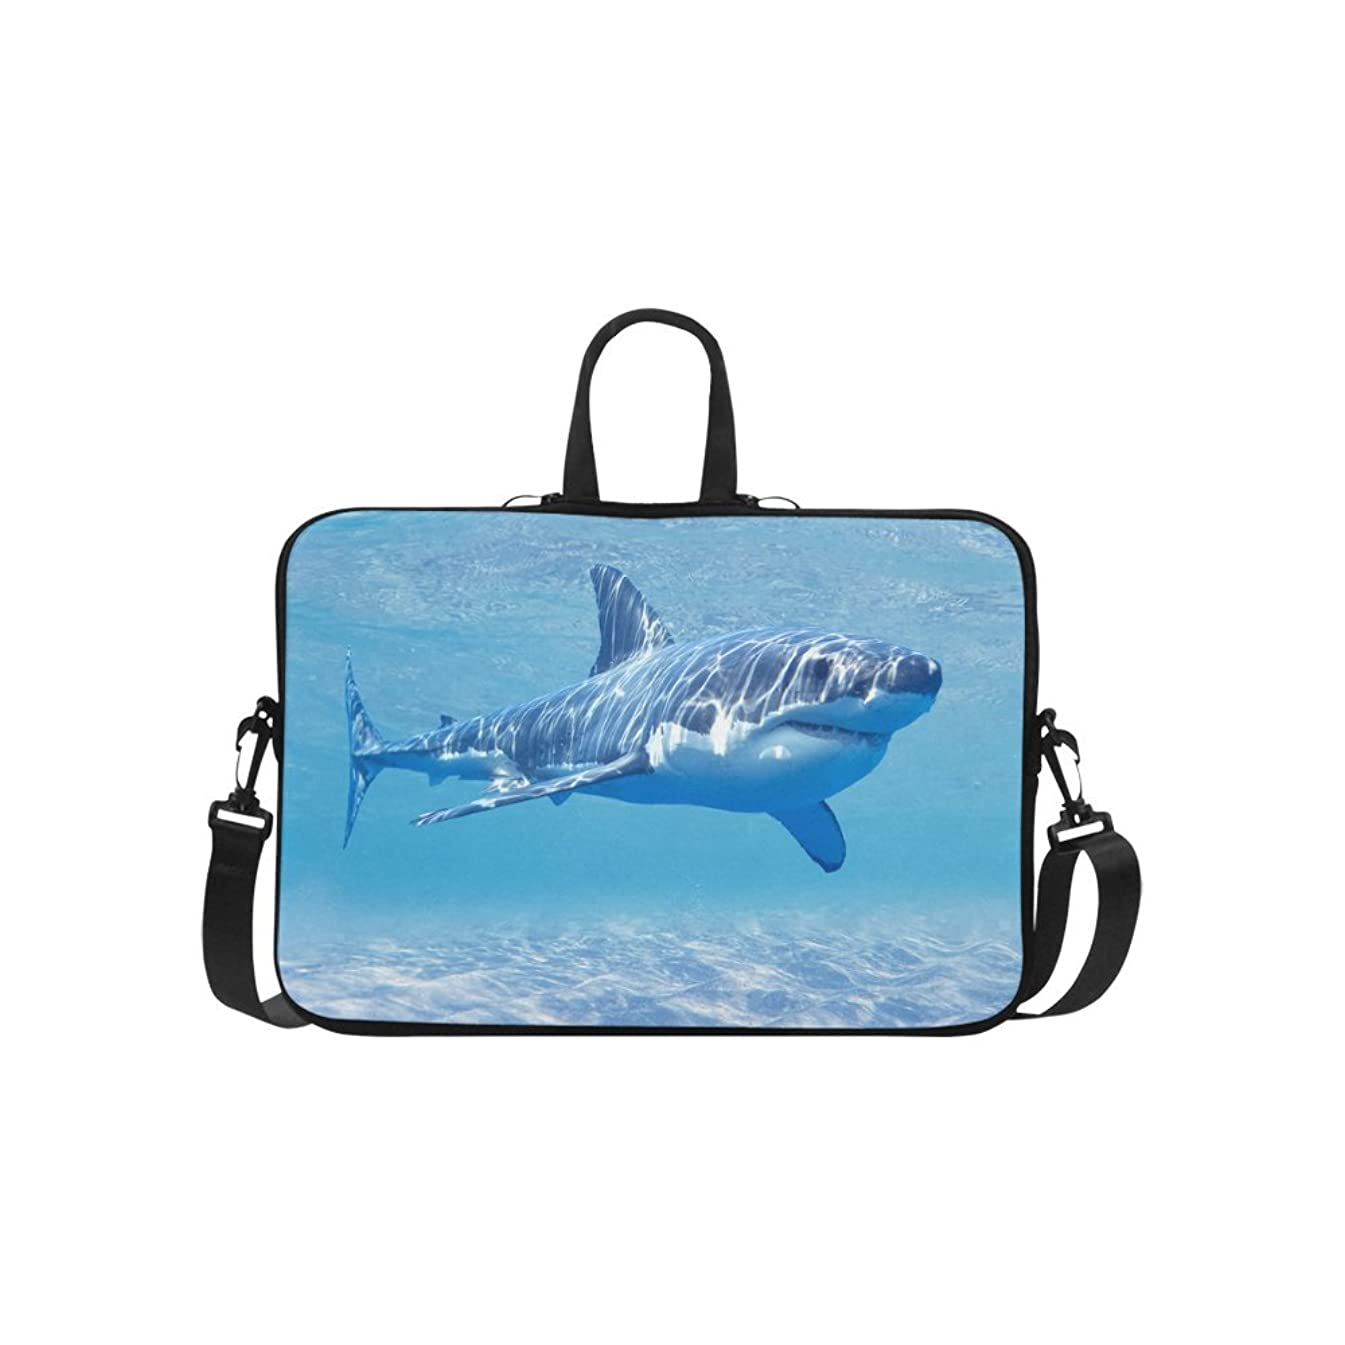 InterestPrint Ocean Sea Shark Laptop Sleeve Case Bag, Underwater World Shark Shoulder Strap Laptop Sleeve Notebook Computer Bag 15-15.6 Inch for Macbook Pro Air Dell HP Lenovo Thinkpad Acer Ultrabook